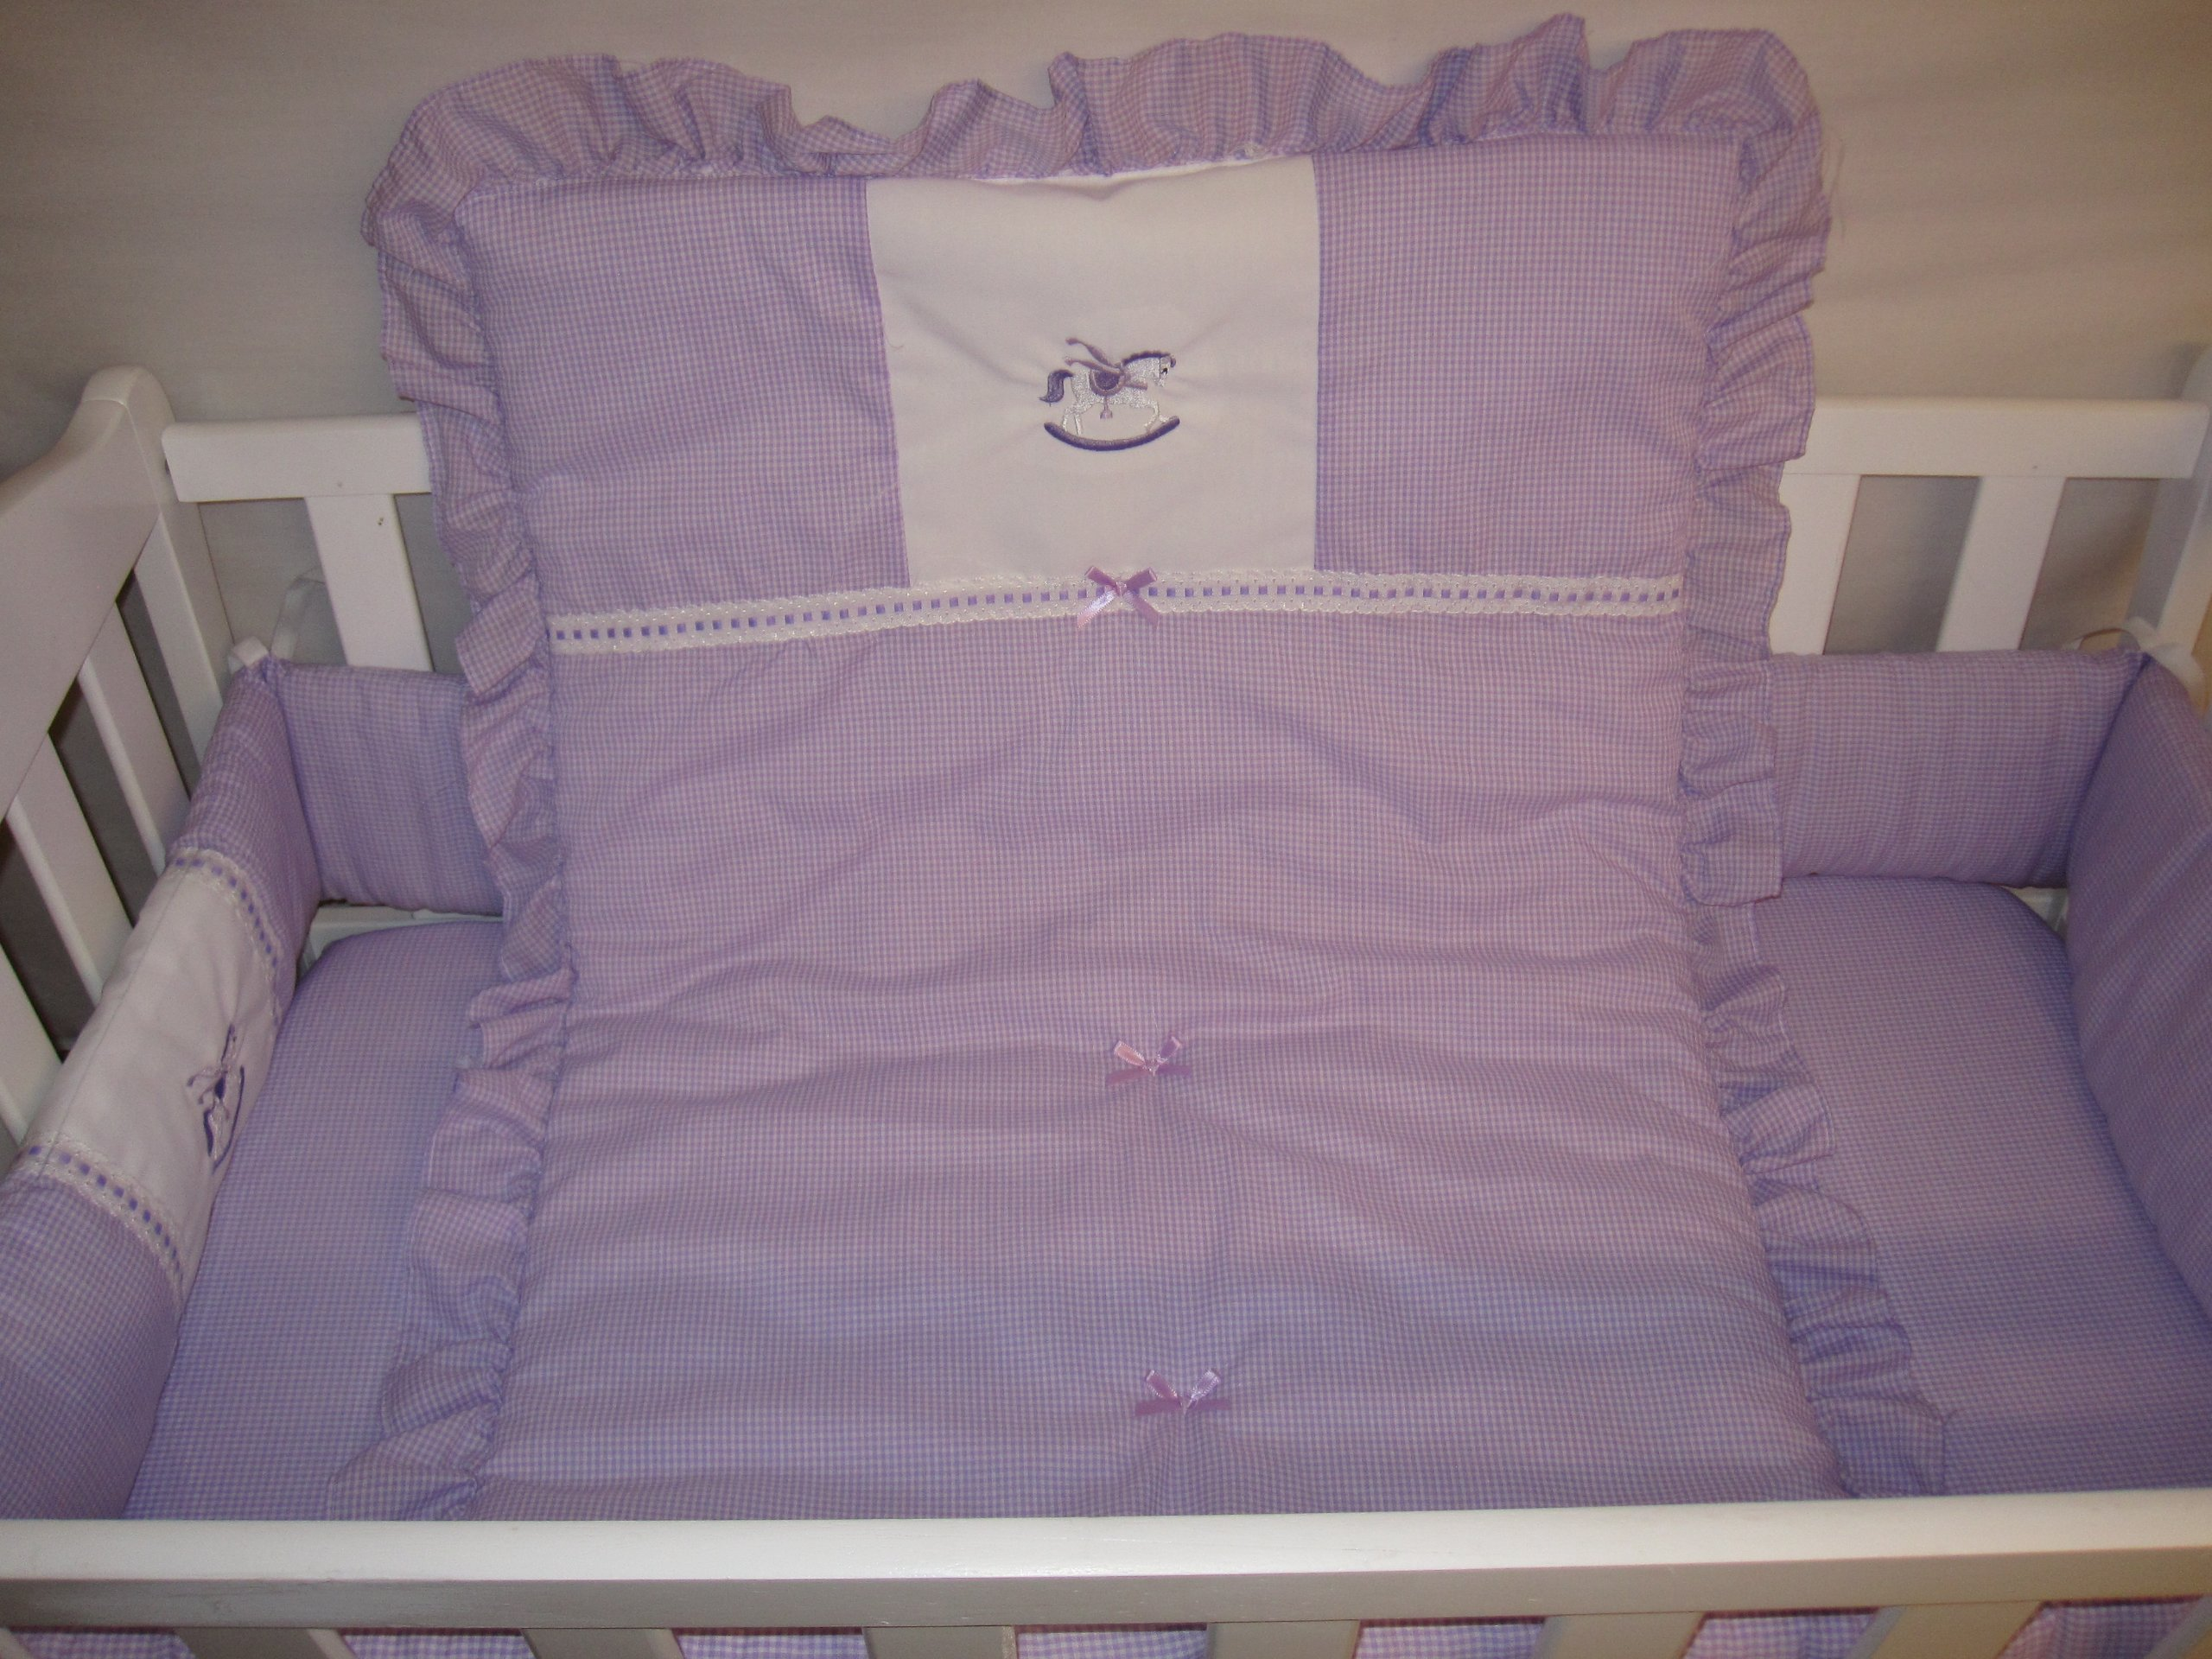 Baby Doll Bedding Gingham with Rocking Horse Applique Cradle Bedding Set, Lavender